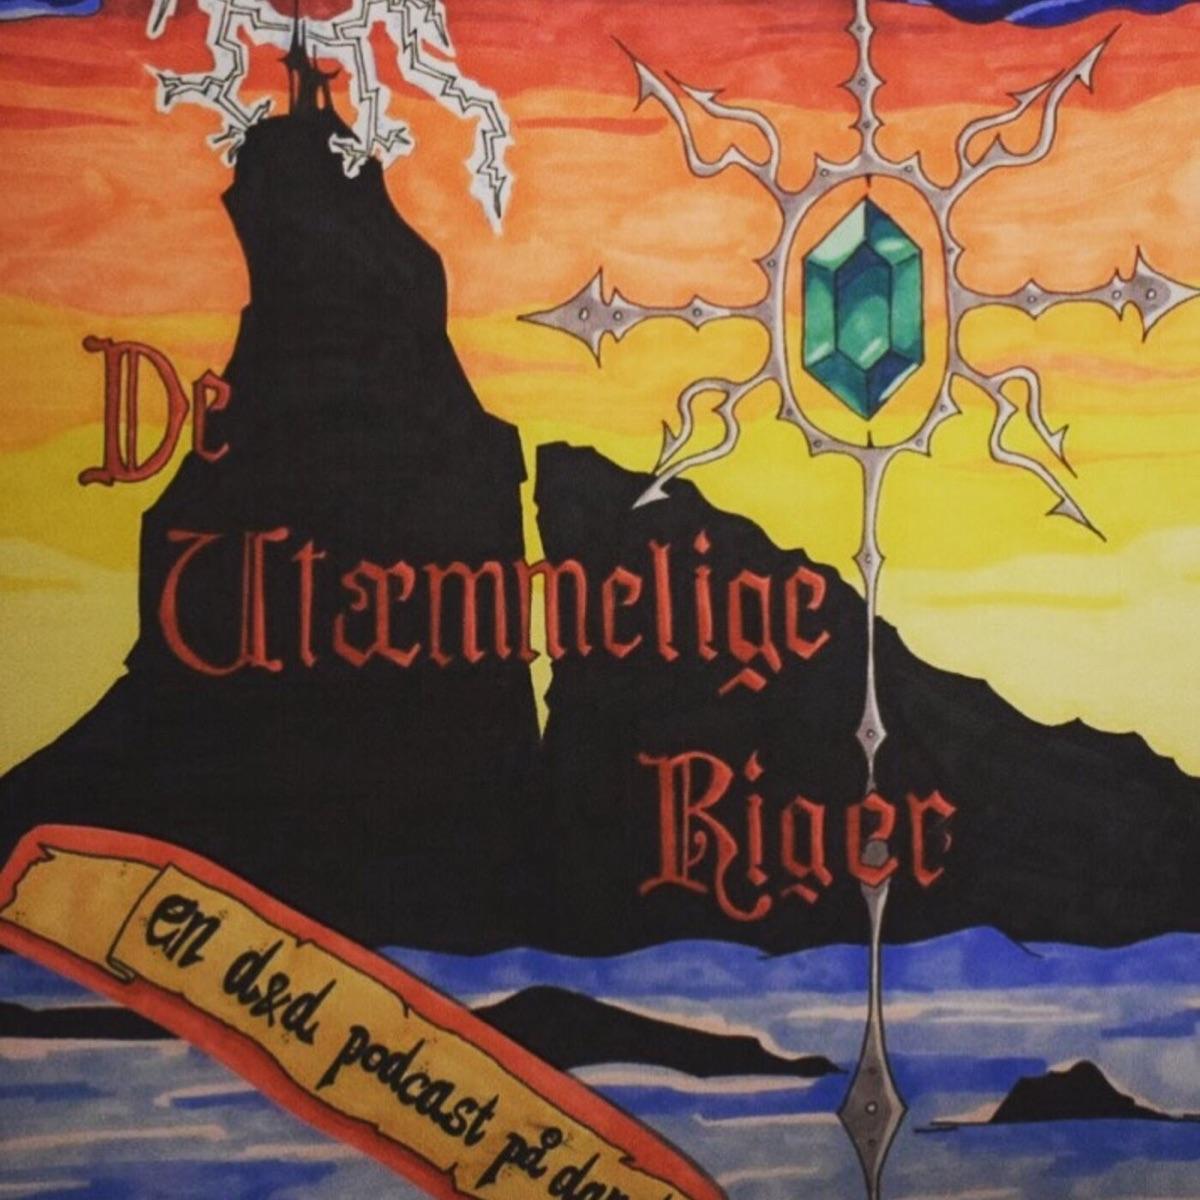 De Utæmmelige Riger - en D&D podcast